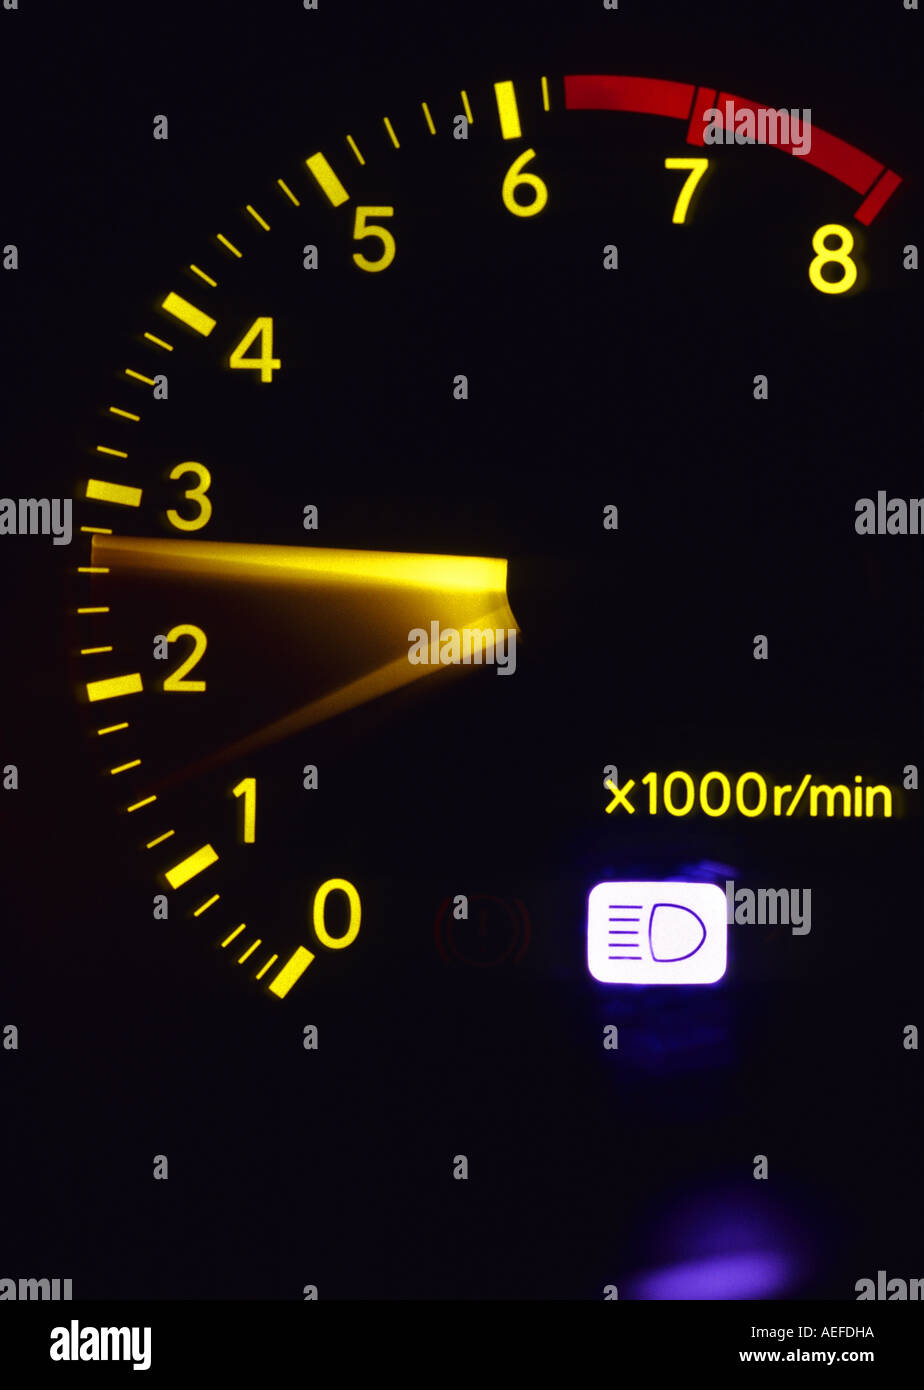 Motor Revolution Counter Dial-on-Dashboard-Konsole des Fahrzeugs in der Nacht Stockbild